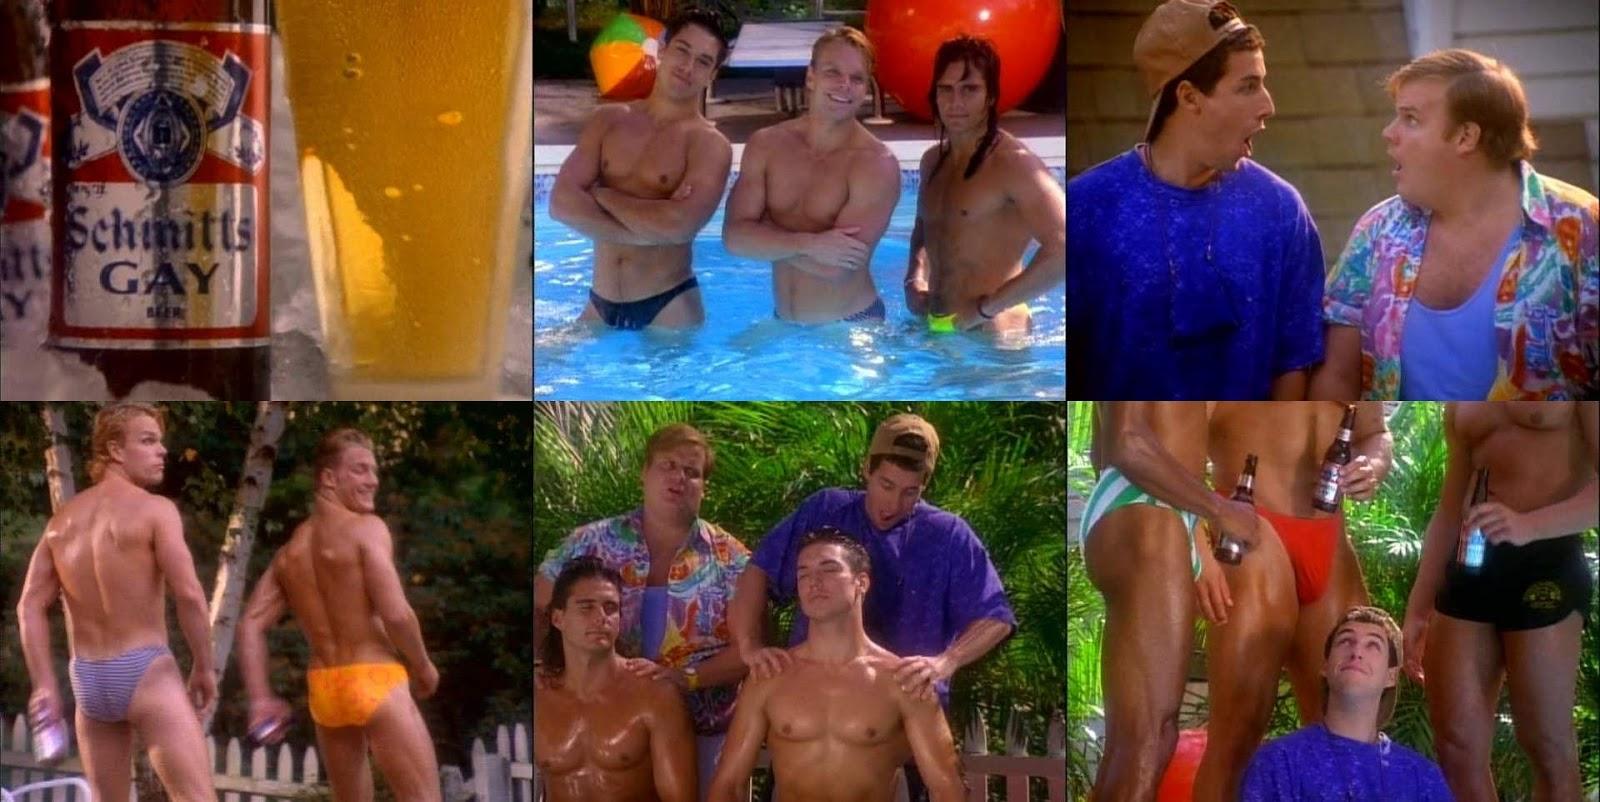 dawn-tits-adam-sandler-xxx-naked-college-girls-gangbang